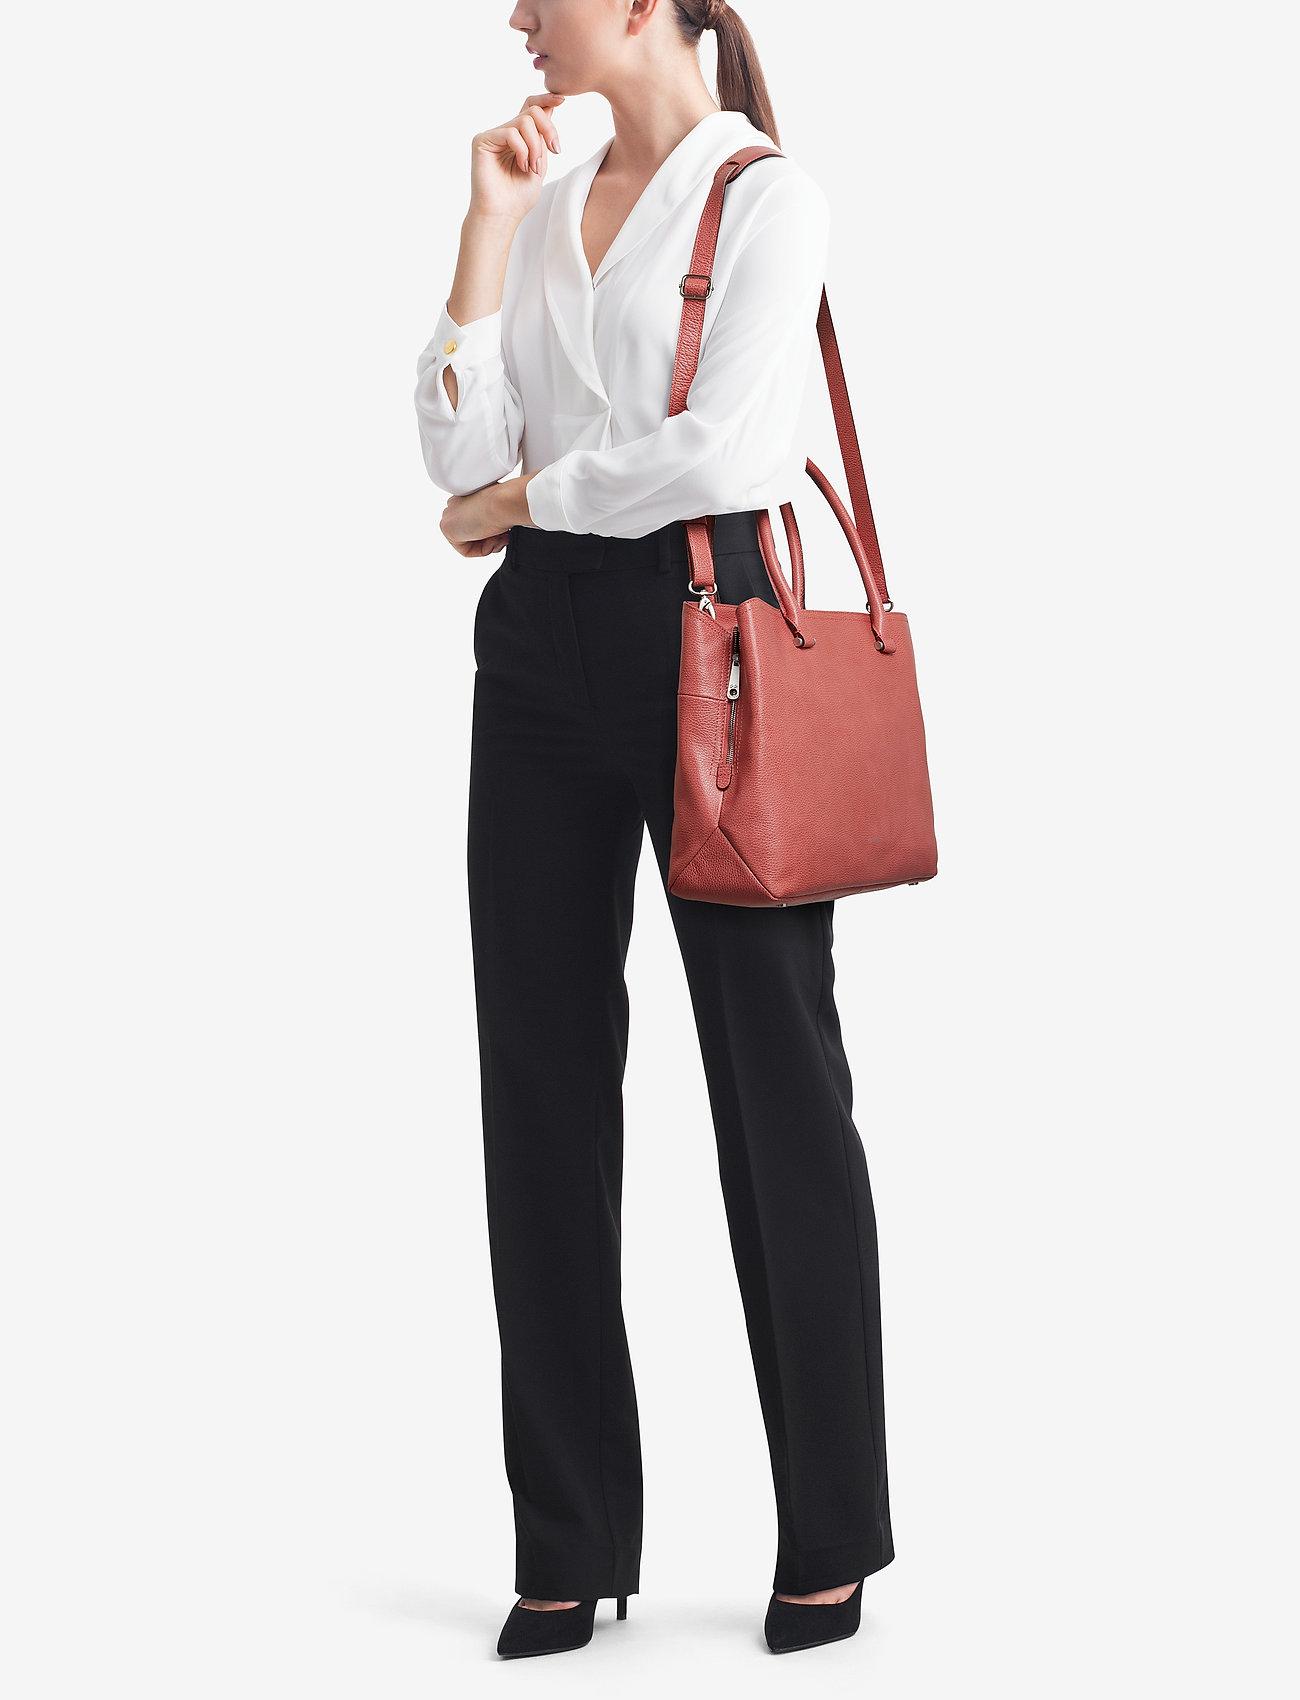 "GiGi Fratelli Romance 15""Businessbag - OLD ROSE"